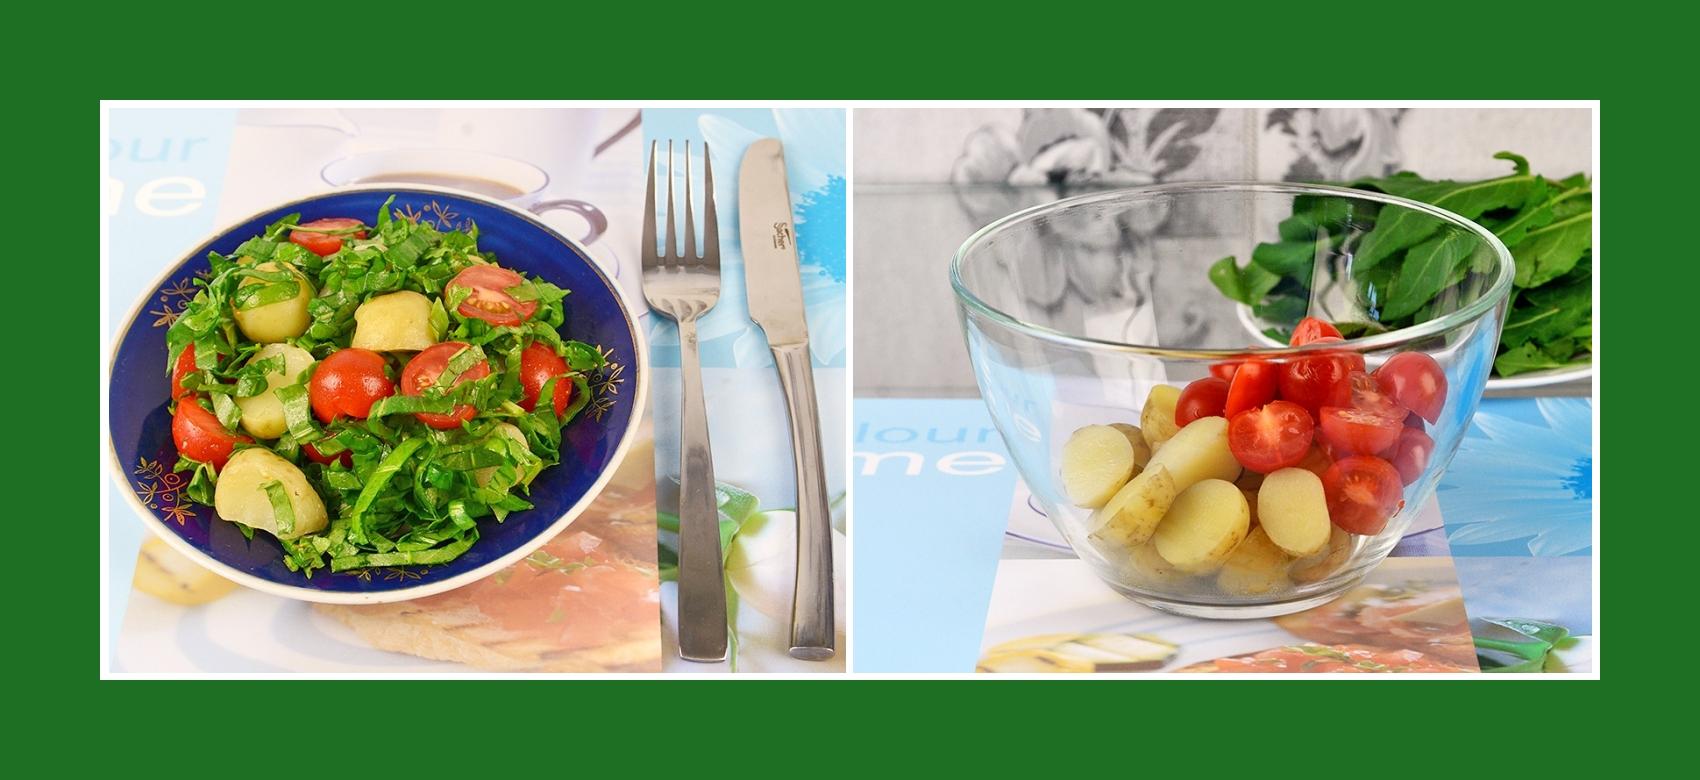 Salat mit Frühkartoffeln und Cherrytomaten